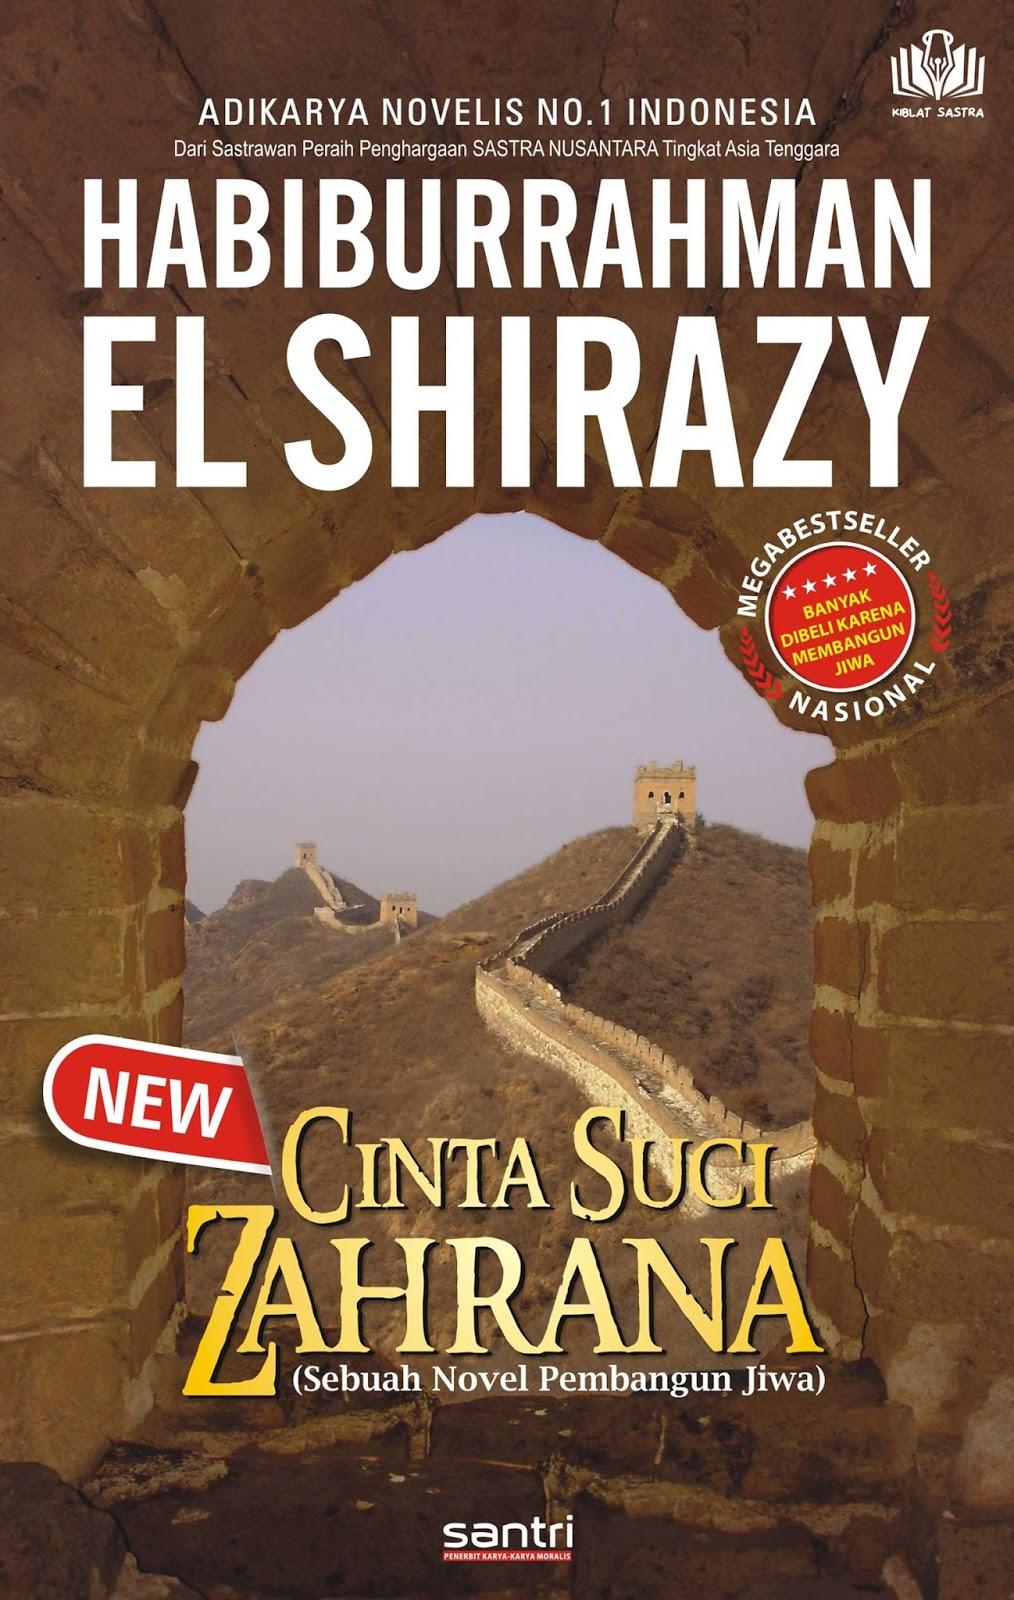 Habiburrahman El-Shirazy - Cinta Suci Zahrana